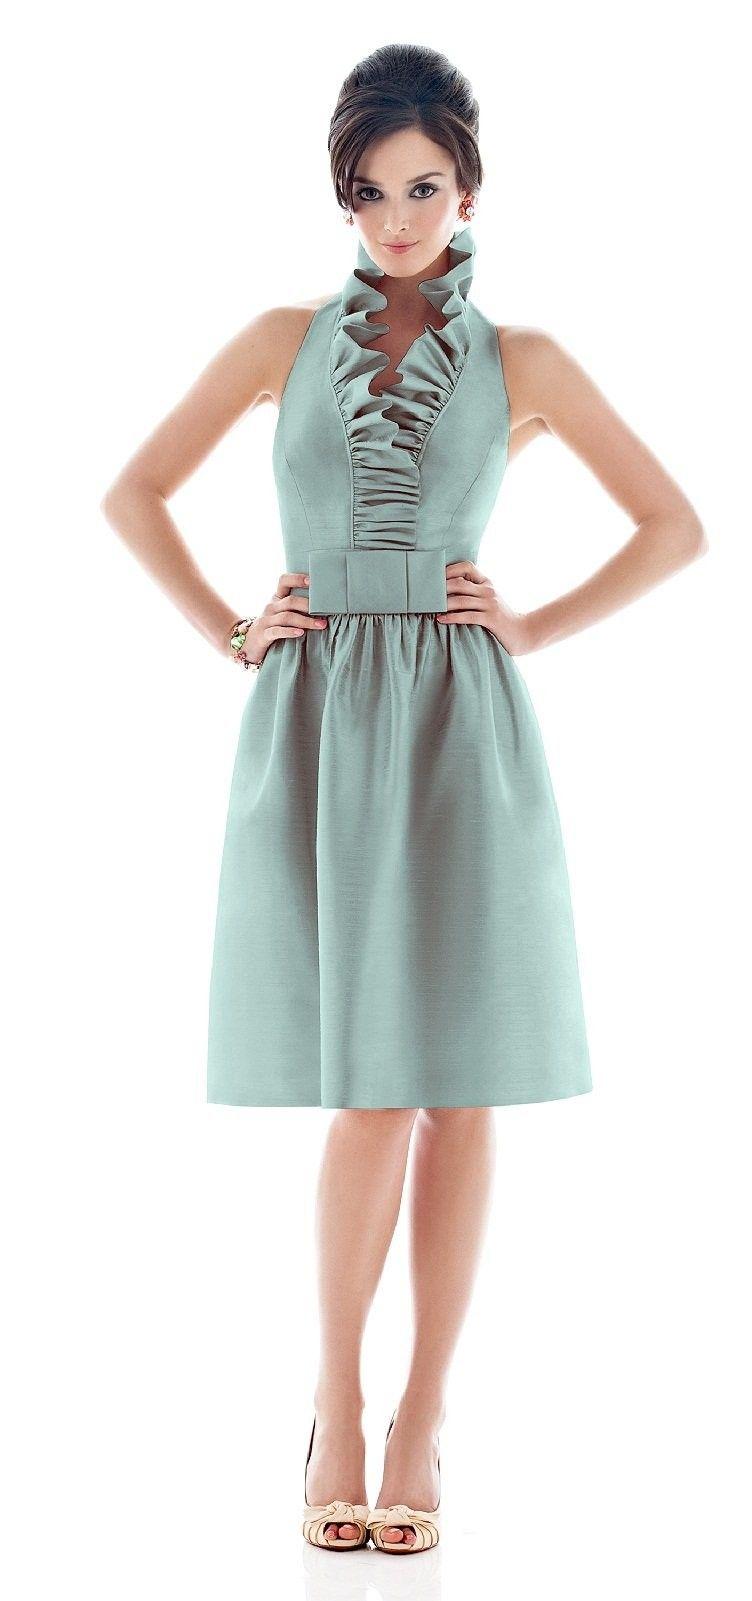 Alisha | all things teal, turquise, mint and aquamarine | Pinterest ...